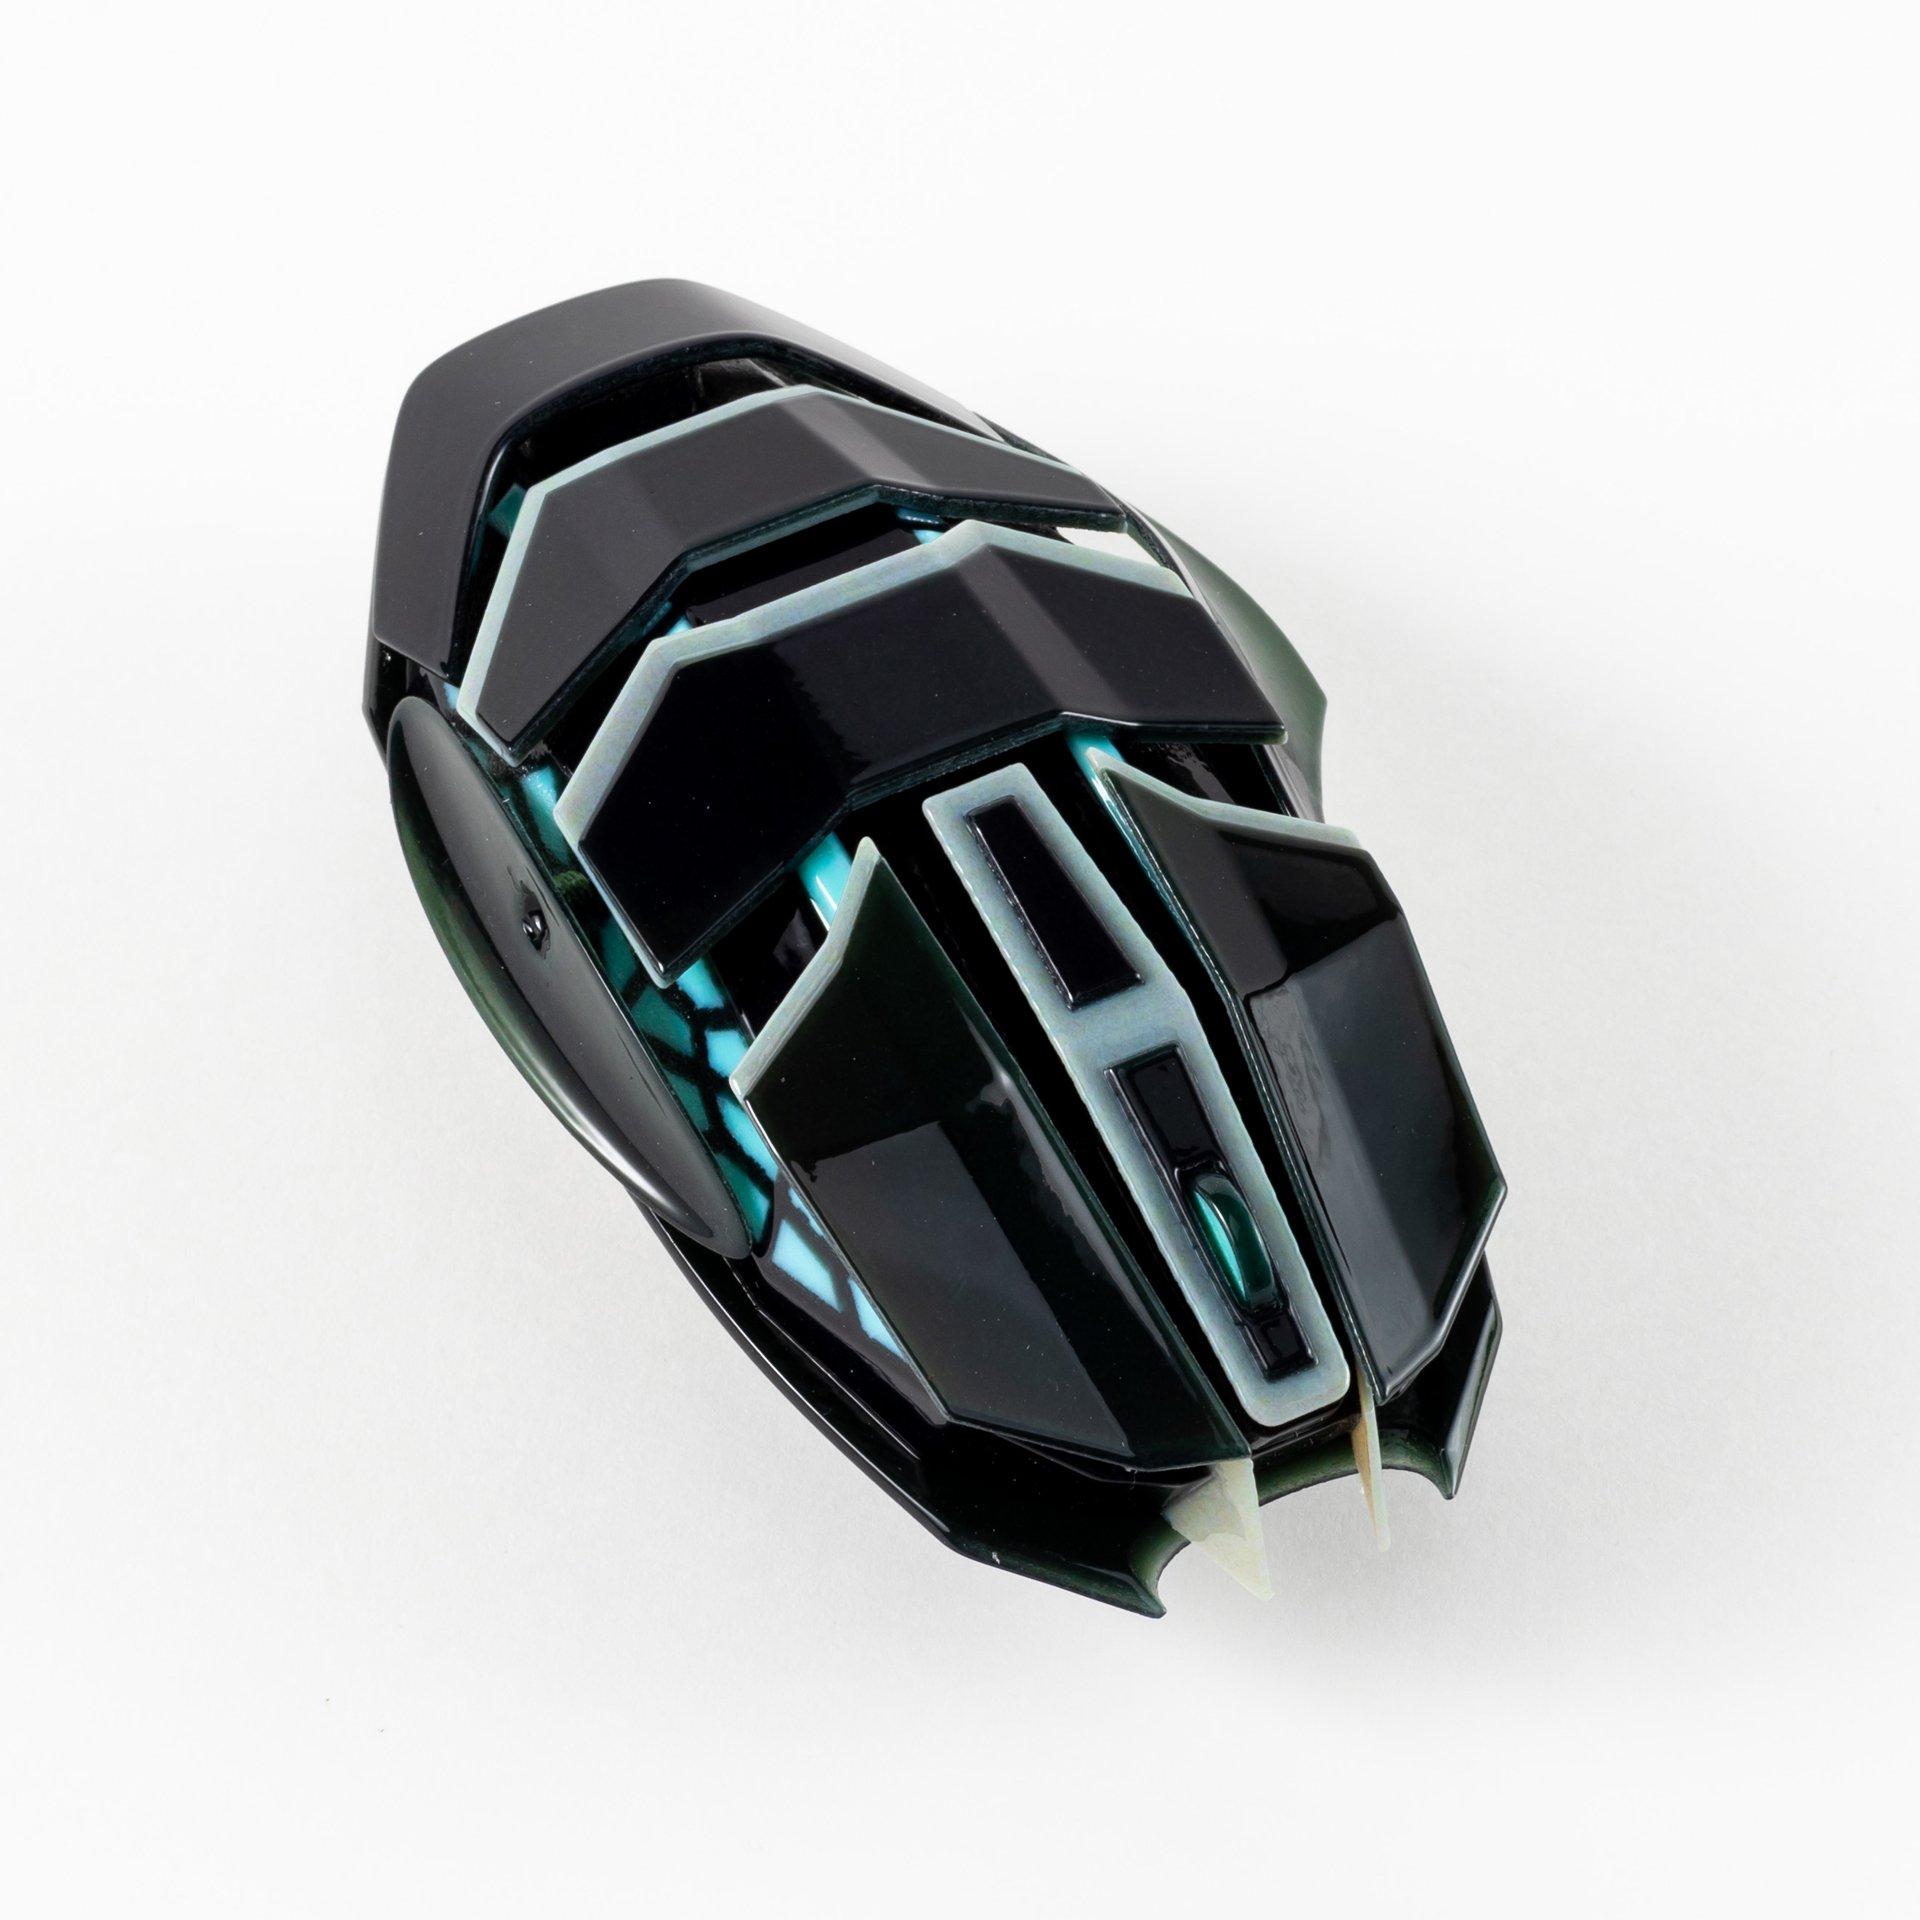 grabcad-stratasys-keyshot-gaming-mouse-dhimas-adi-00-sq